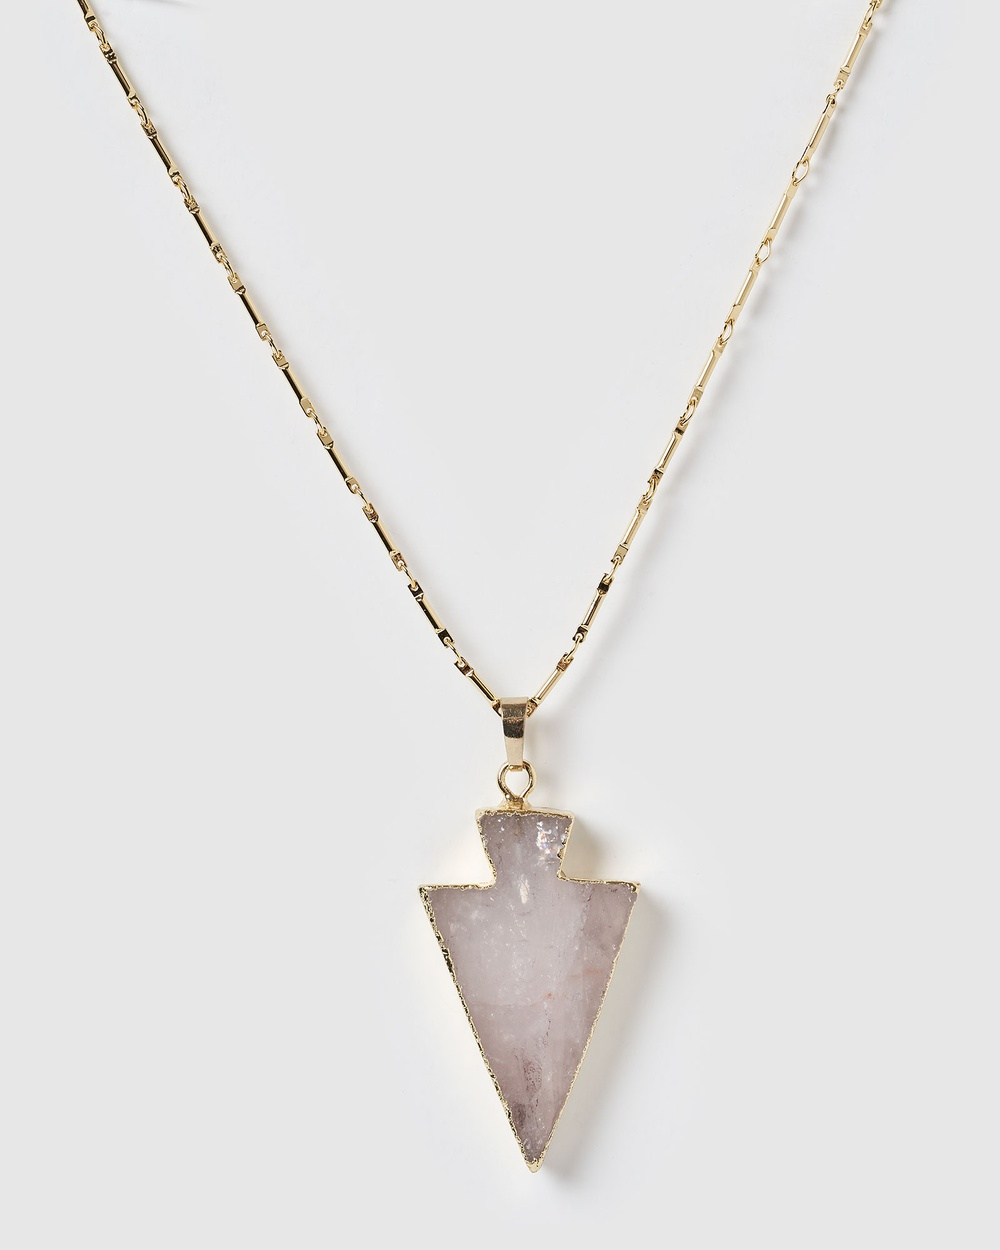 Miz Casa and Co Orient Pendant Necklace Jewellery Gold